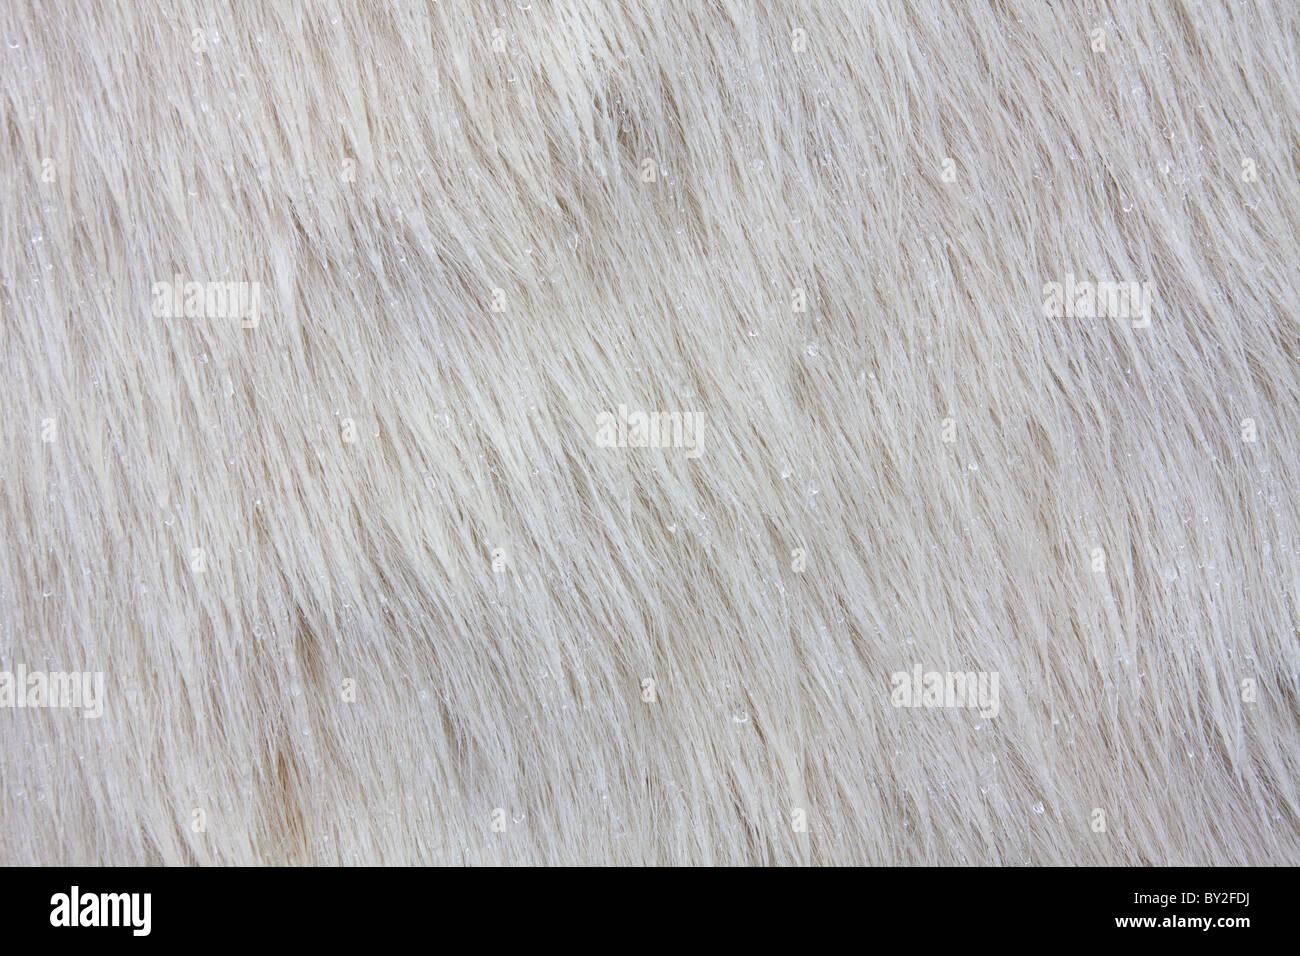 Polar Bear (Ursus maritimus / Thalarctos maritimus) fur close-up, Ilulissat, Disko-Bay, West-Greenland, Greenland - Stock Image